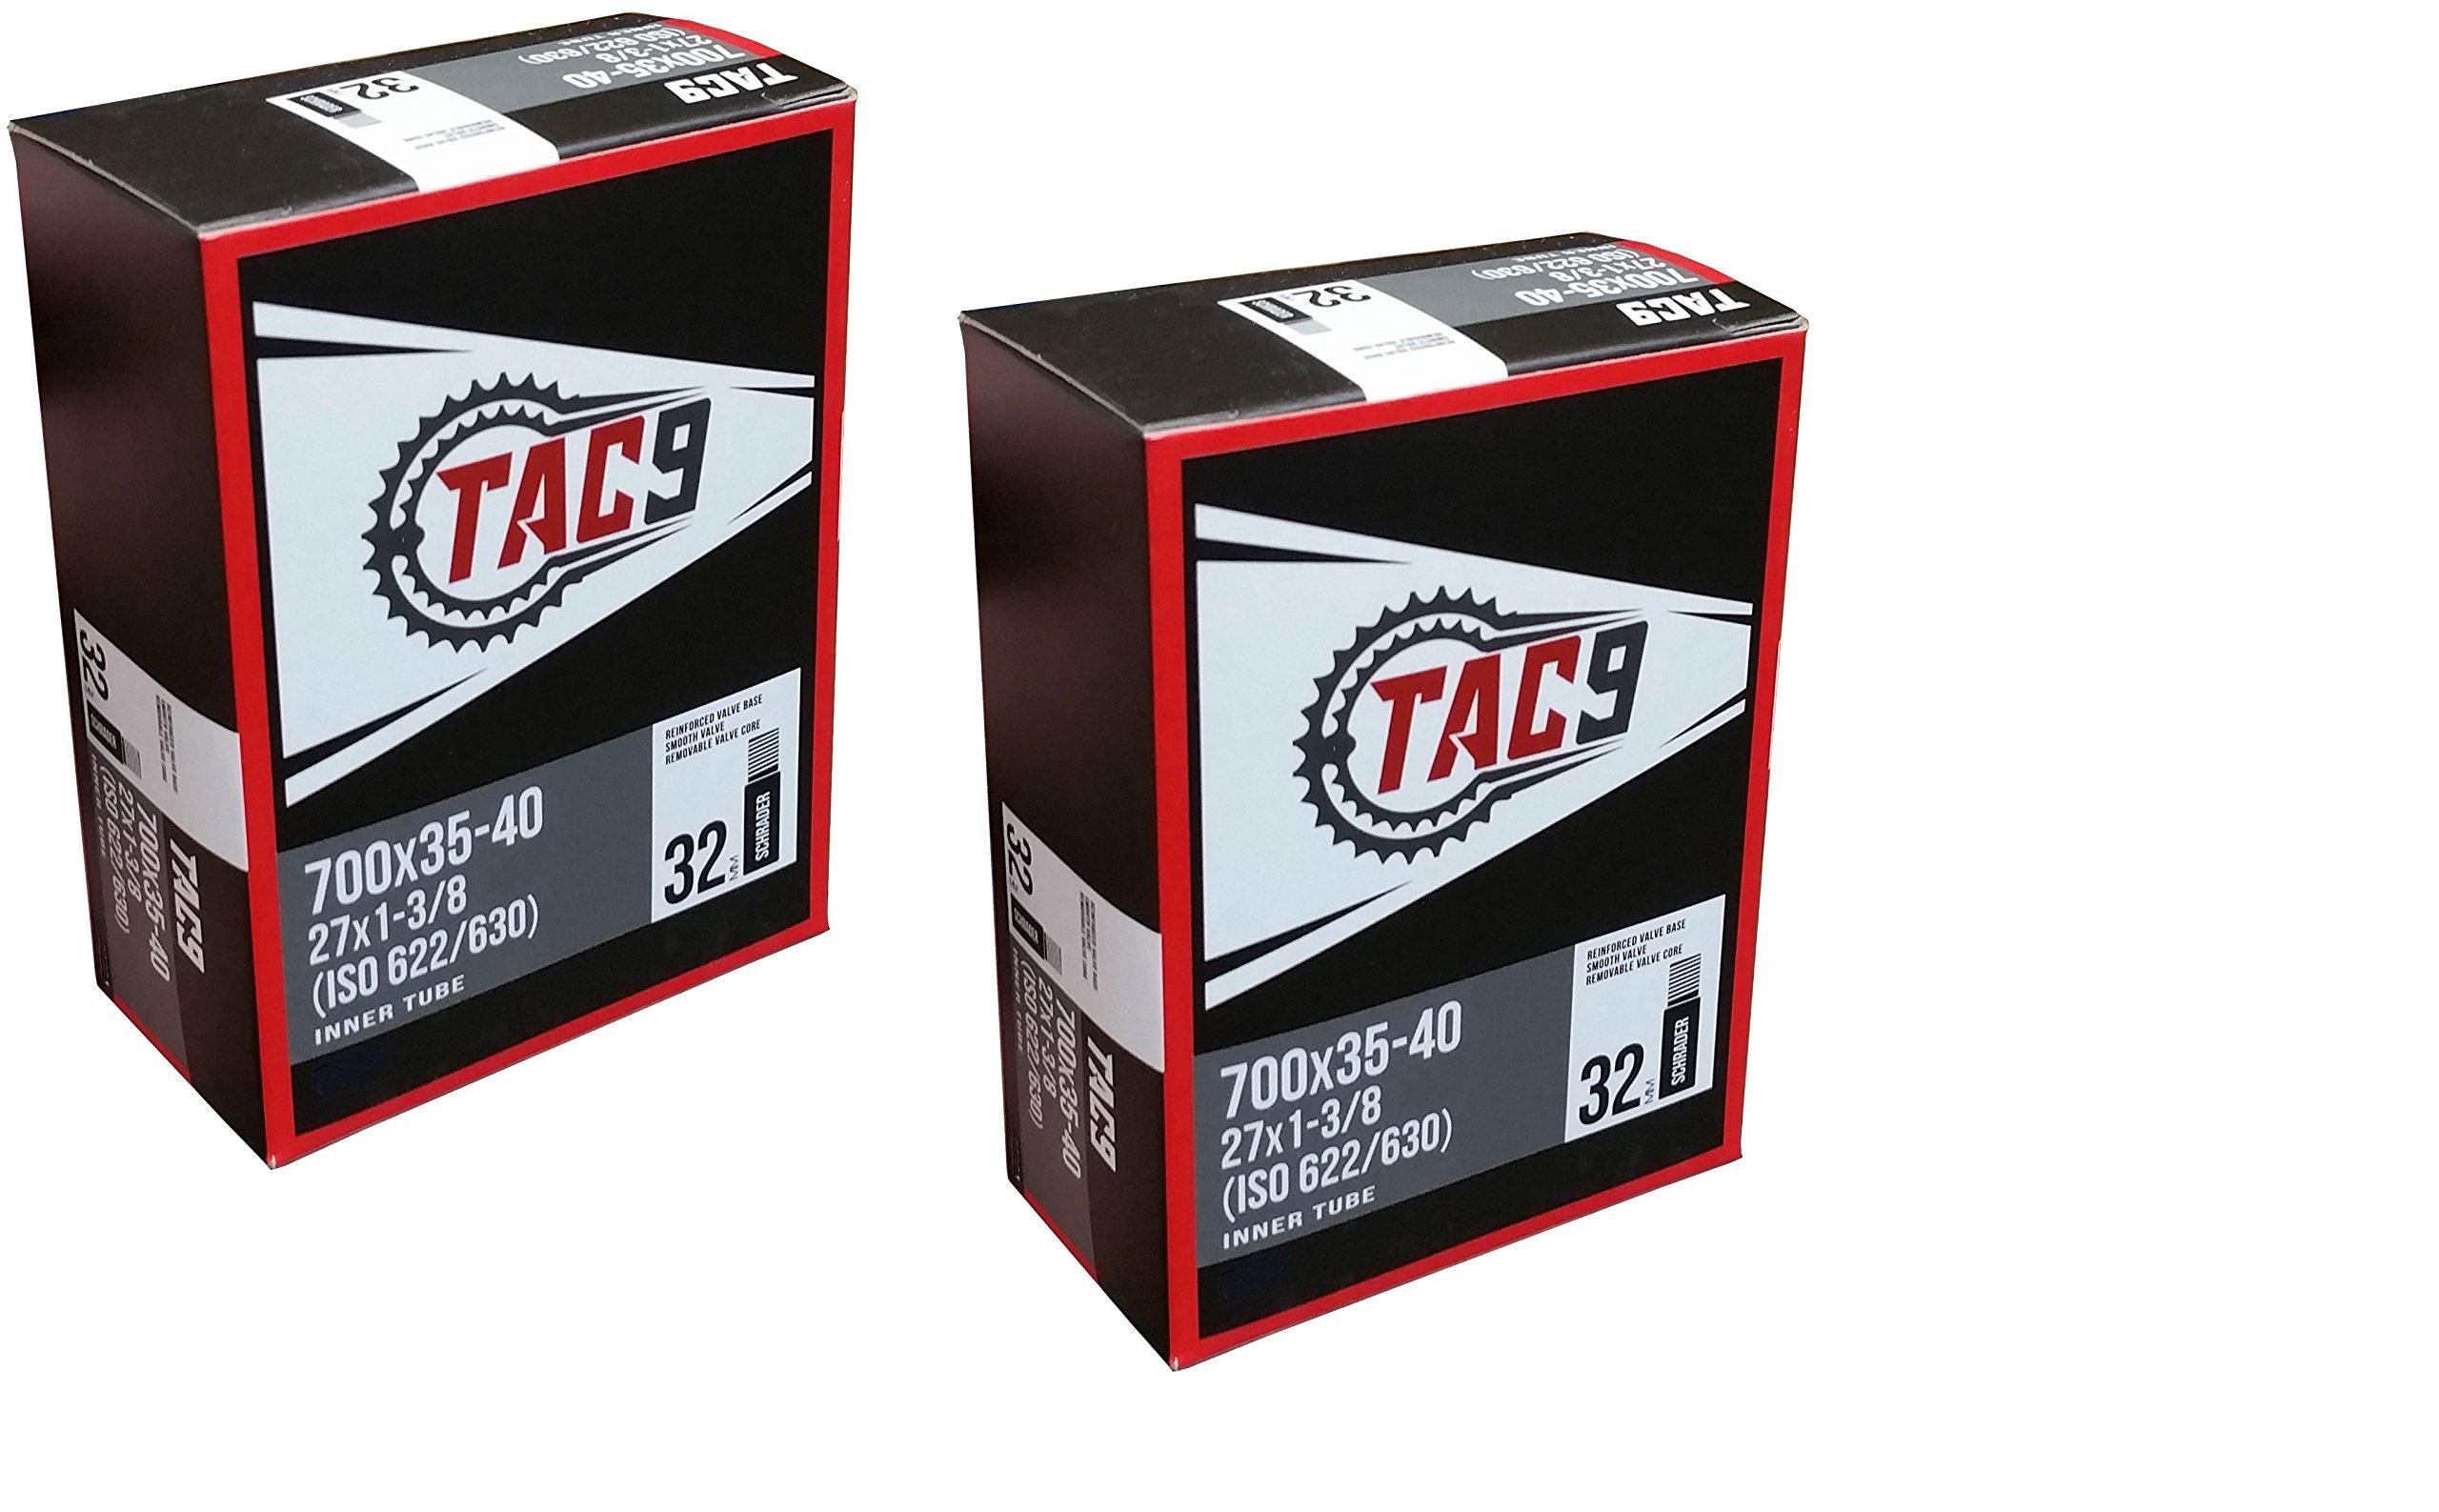 TAC 9 Tubes, 700 x 35 40 (27 x 1 3/8) Regular Schrader Valve, 32mm (ISO 622/630)